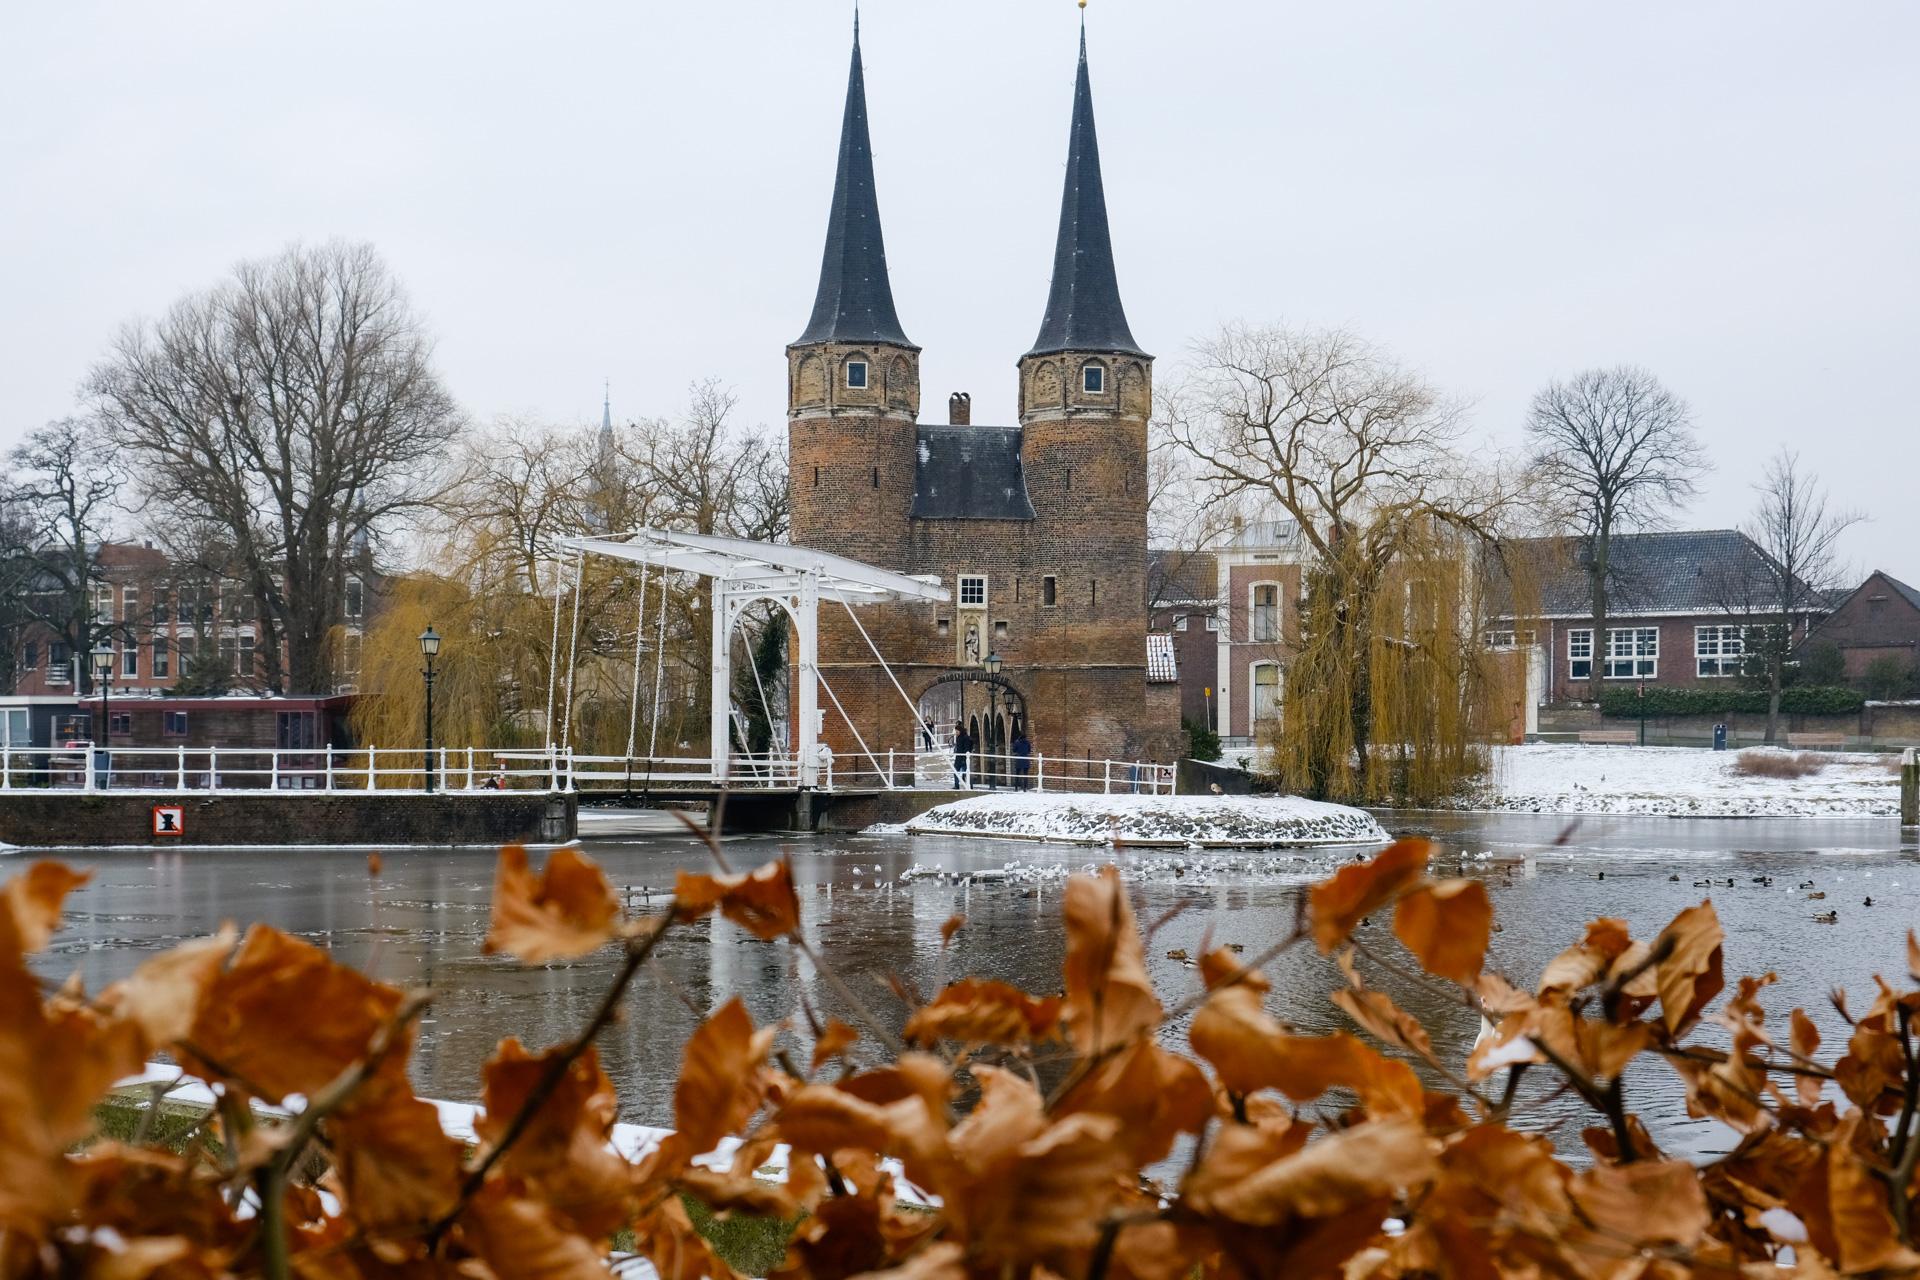 Canal near Oostpoort (Eastern Gate)